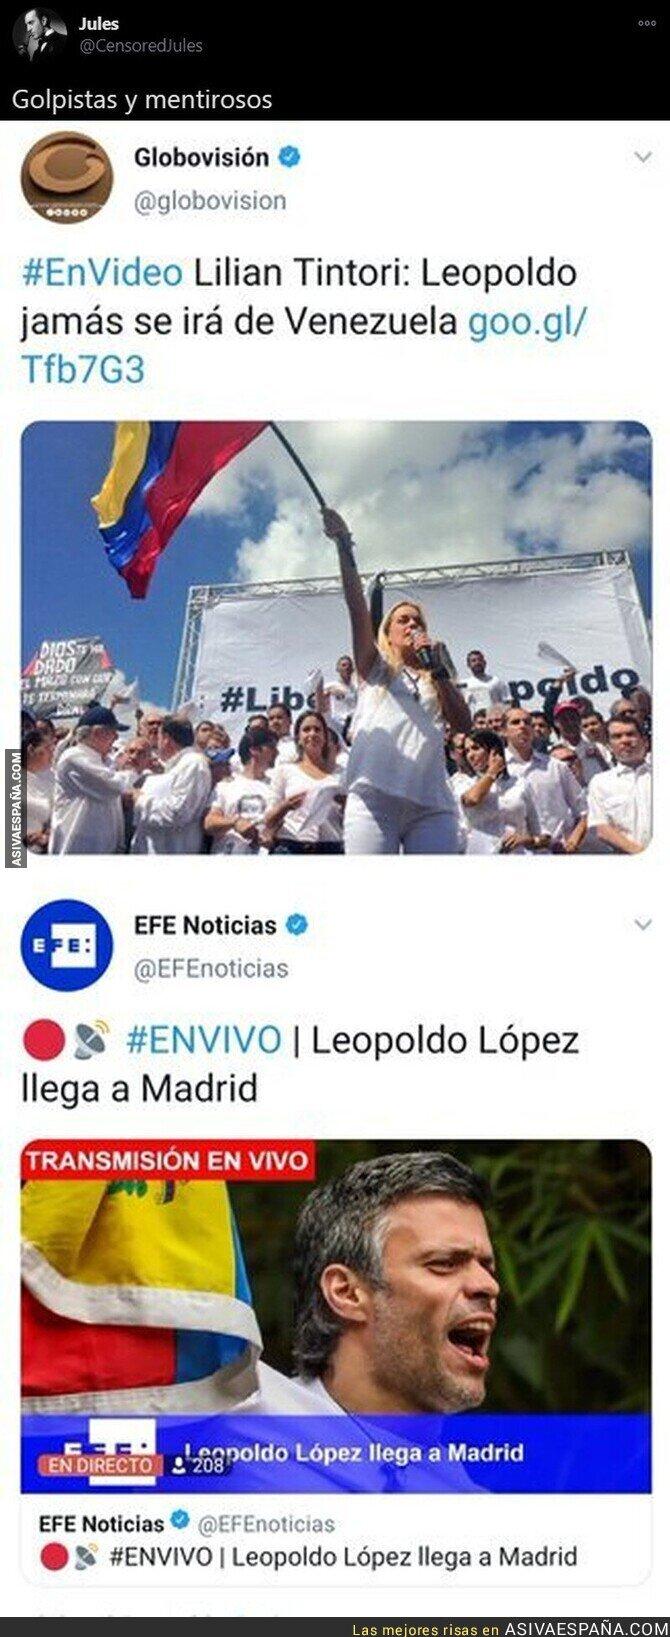 433145 - Casoplón para Leopoldo López en Madrid